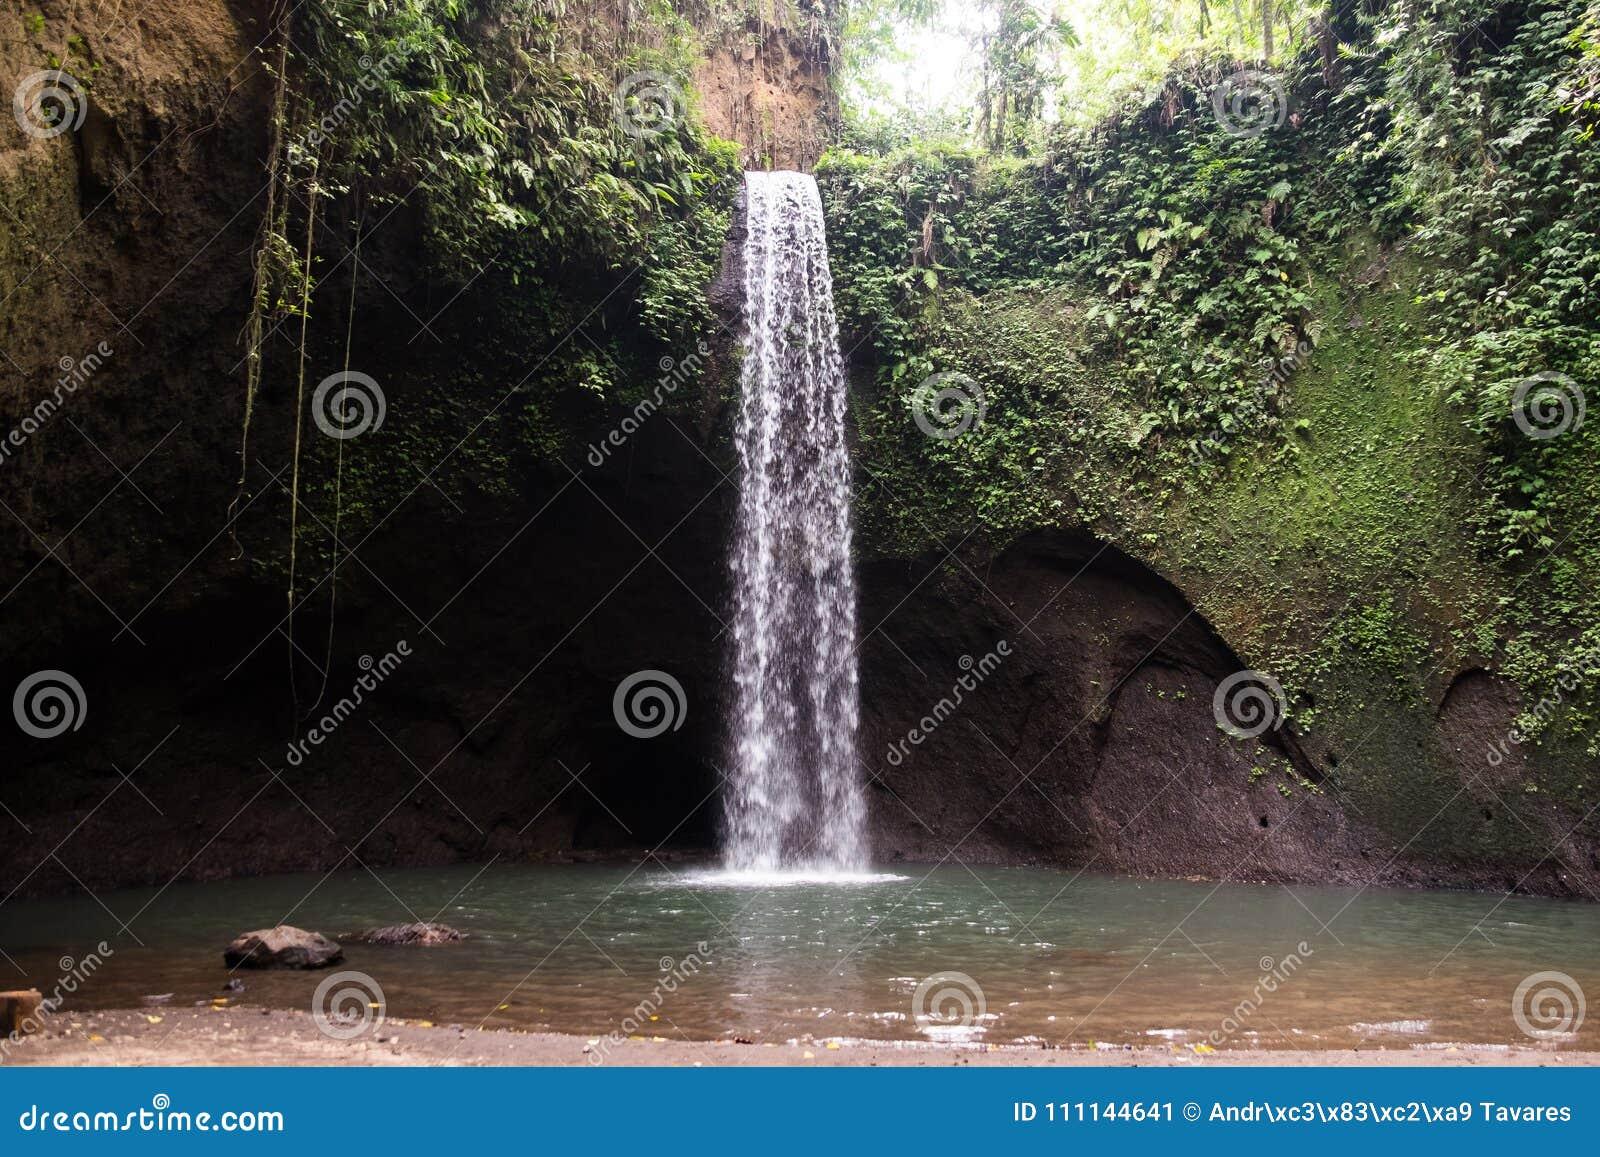 Cachoeira bonita de Sekumpul - Bali, Indonésia